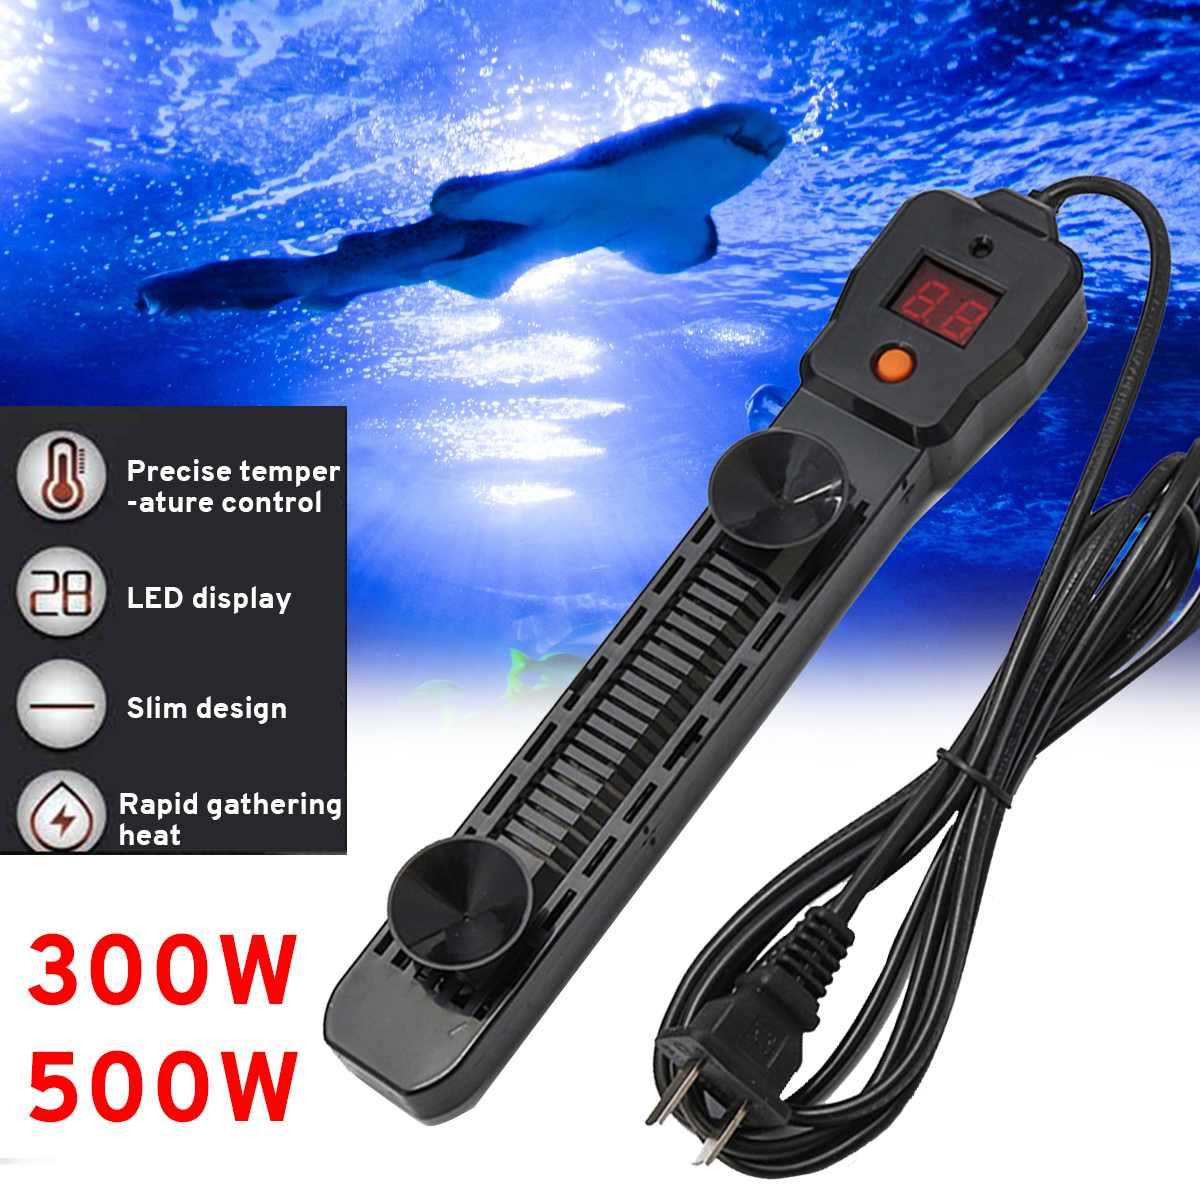 300W 500W LED LCD Display Adjustable Water Heater Rod Autamatic Submersible Aquarium Fish Tank Heater Stick